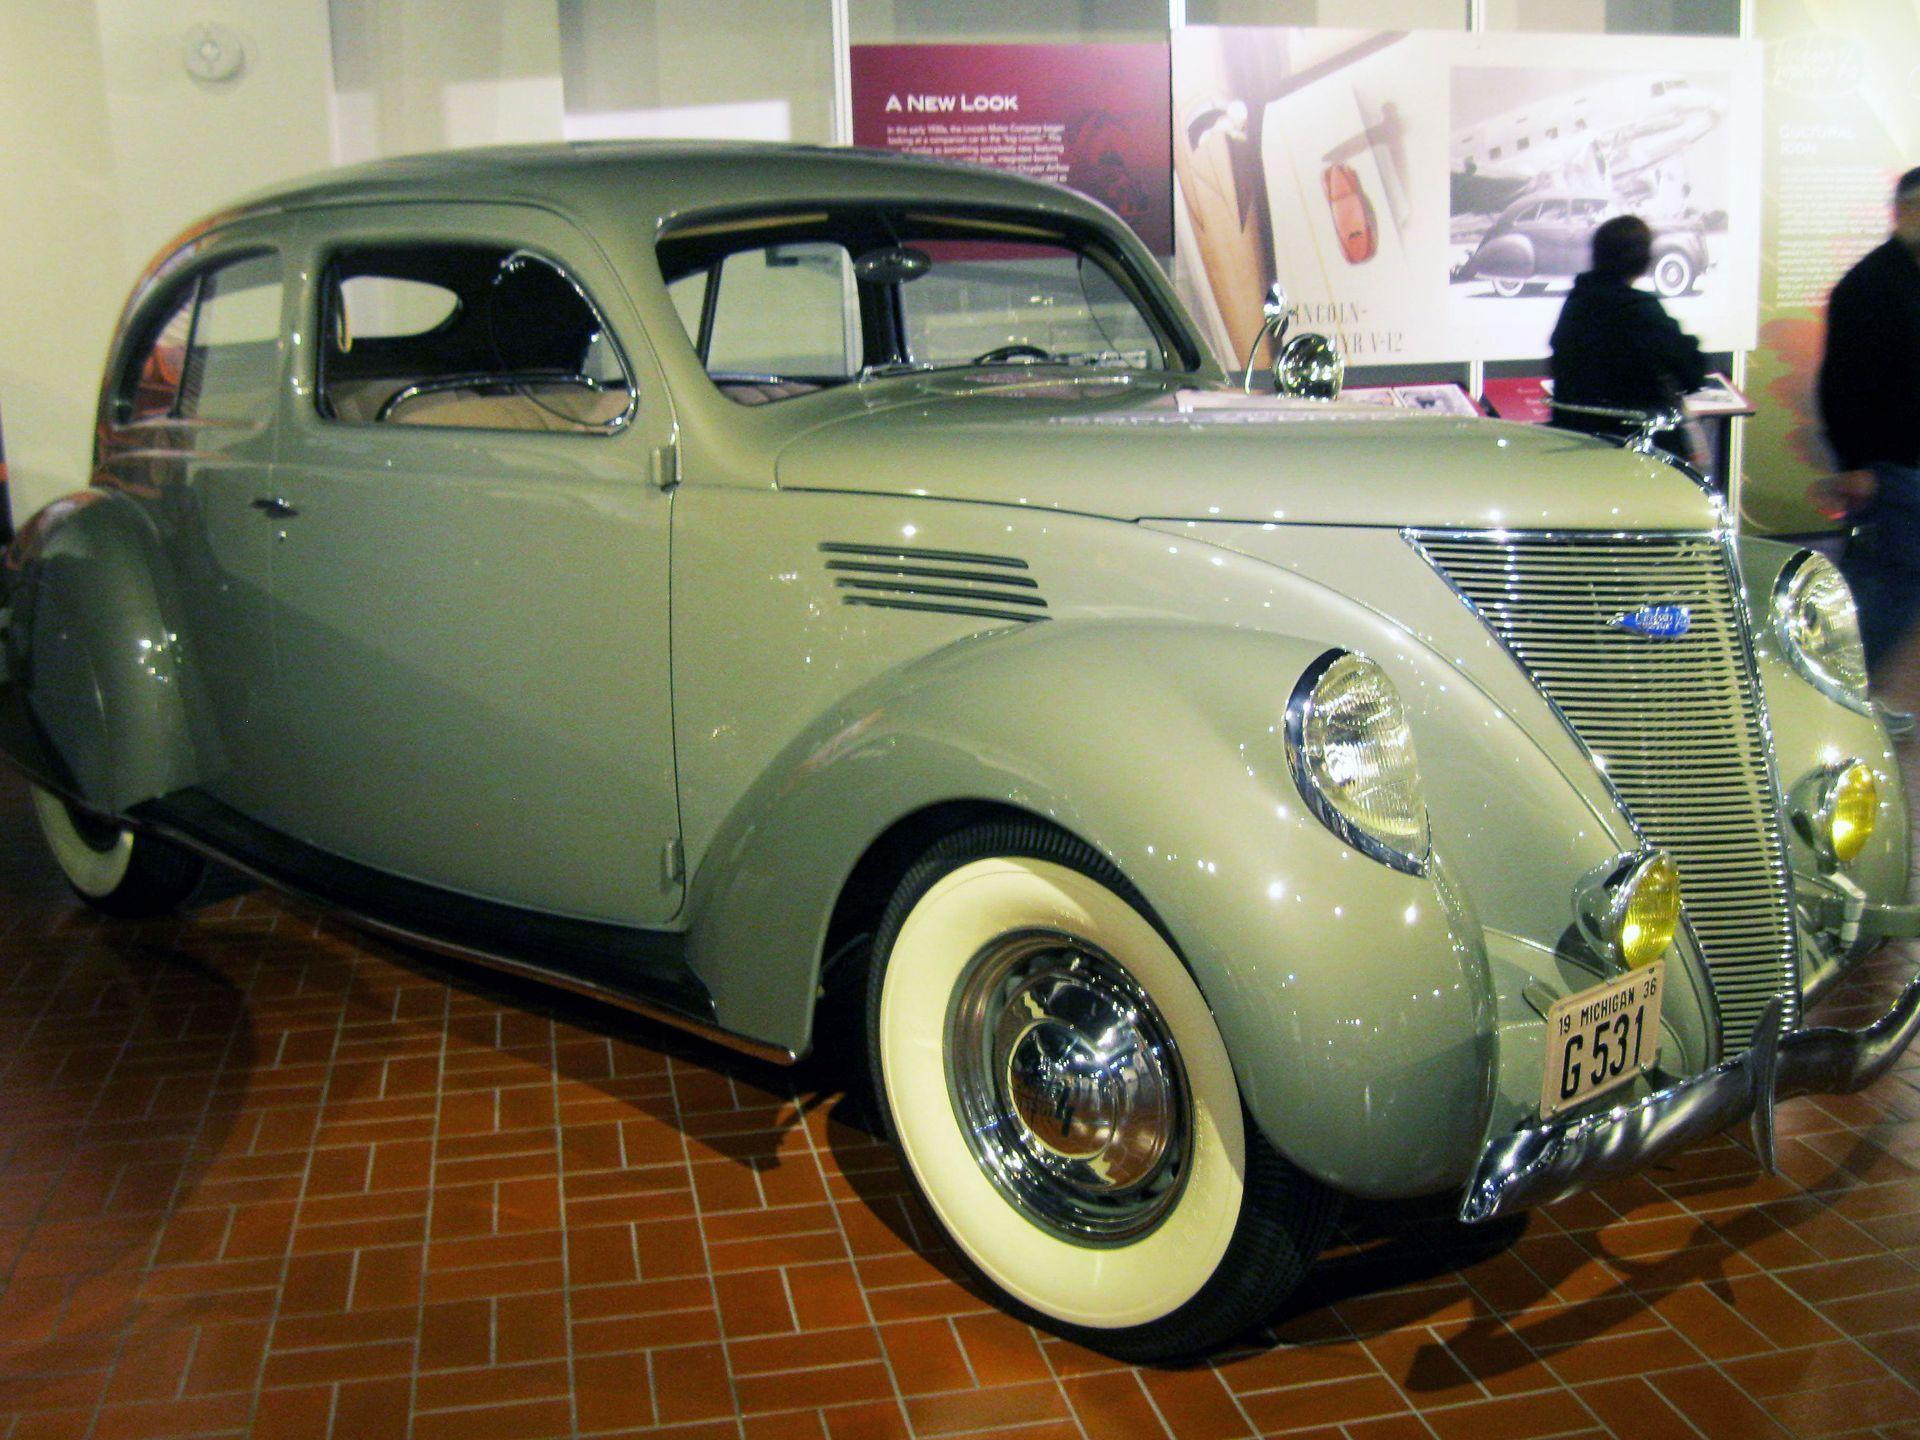 Pin By Bernie NamVet St Cav Div On Tatts Classic Cars Stars - Classy classic cars